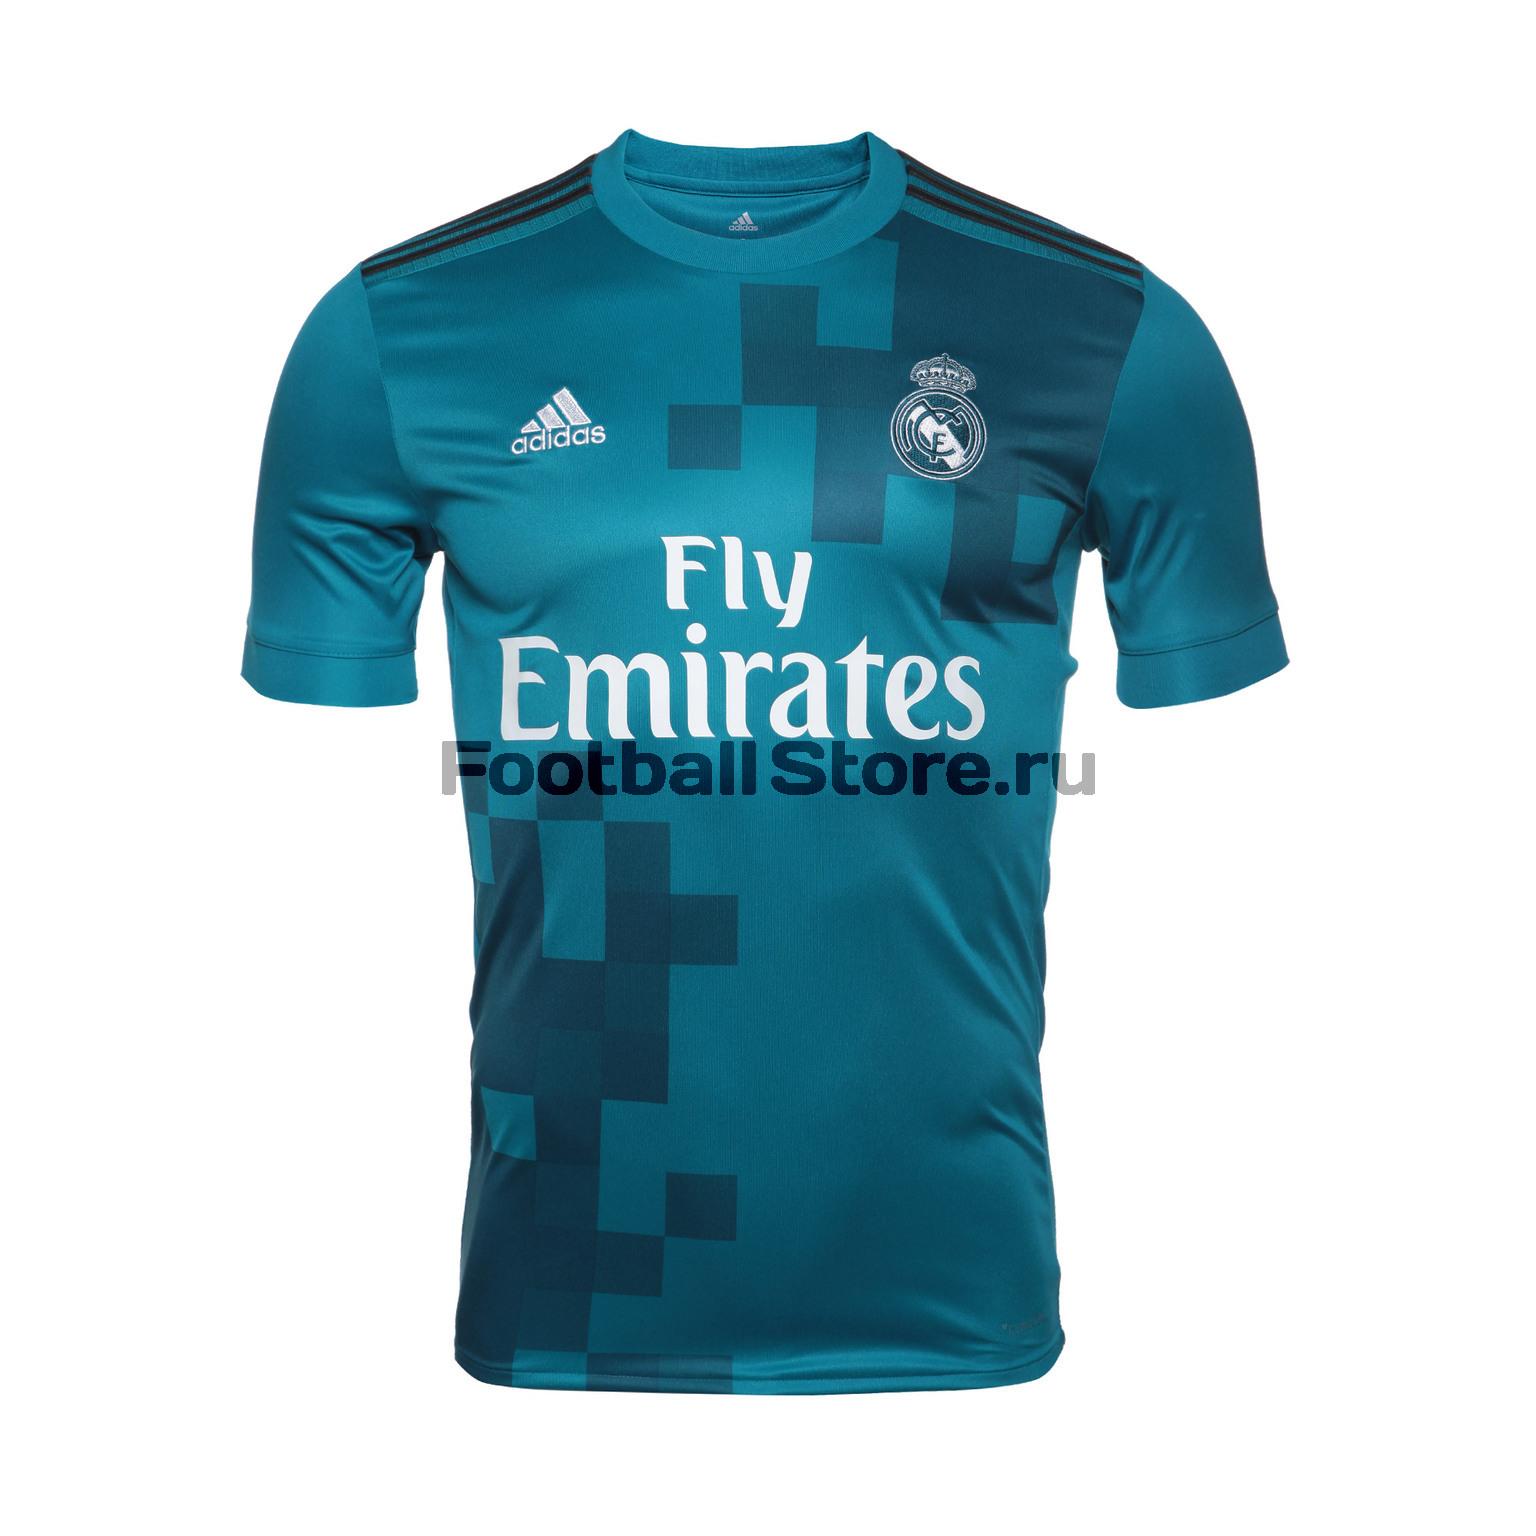 Реплика игровой футболки Adidas Real Madrid BR3539 реплика шлема mich2000 олива